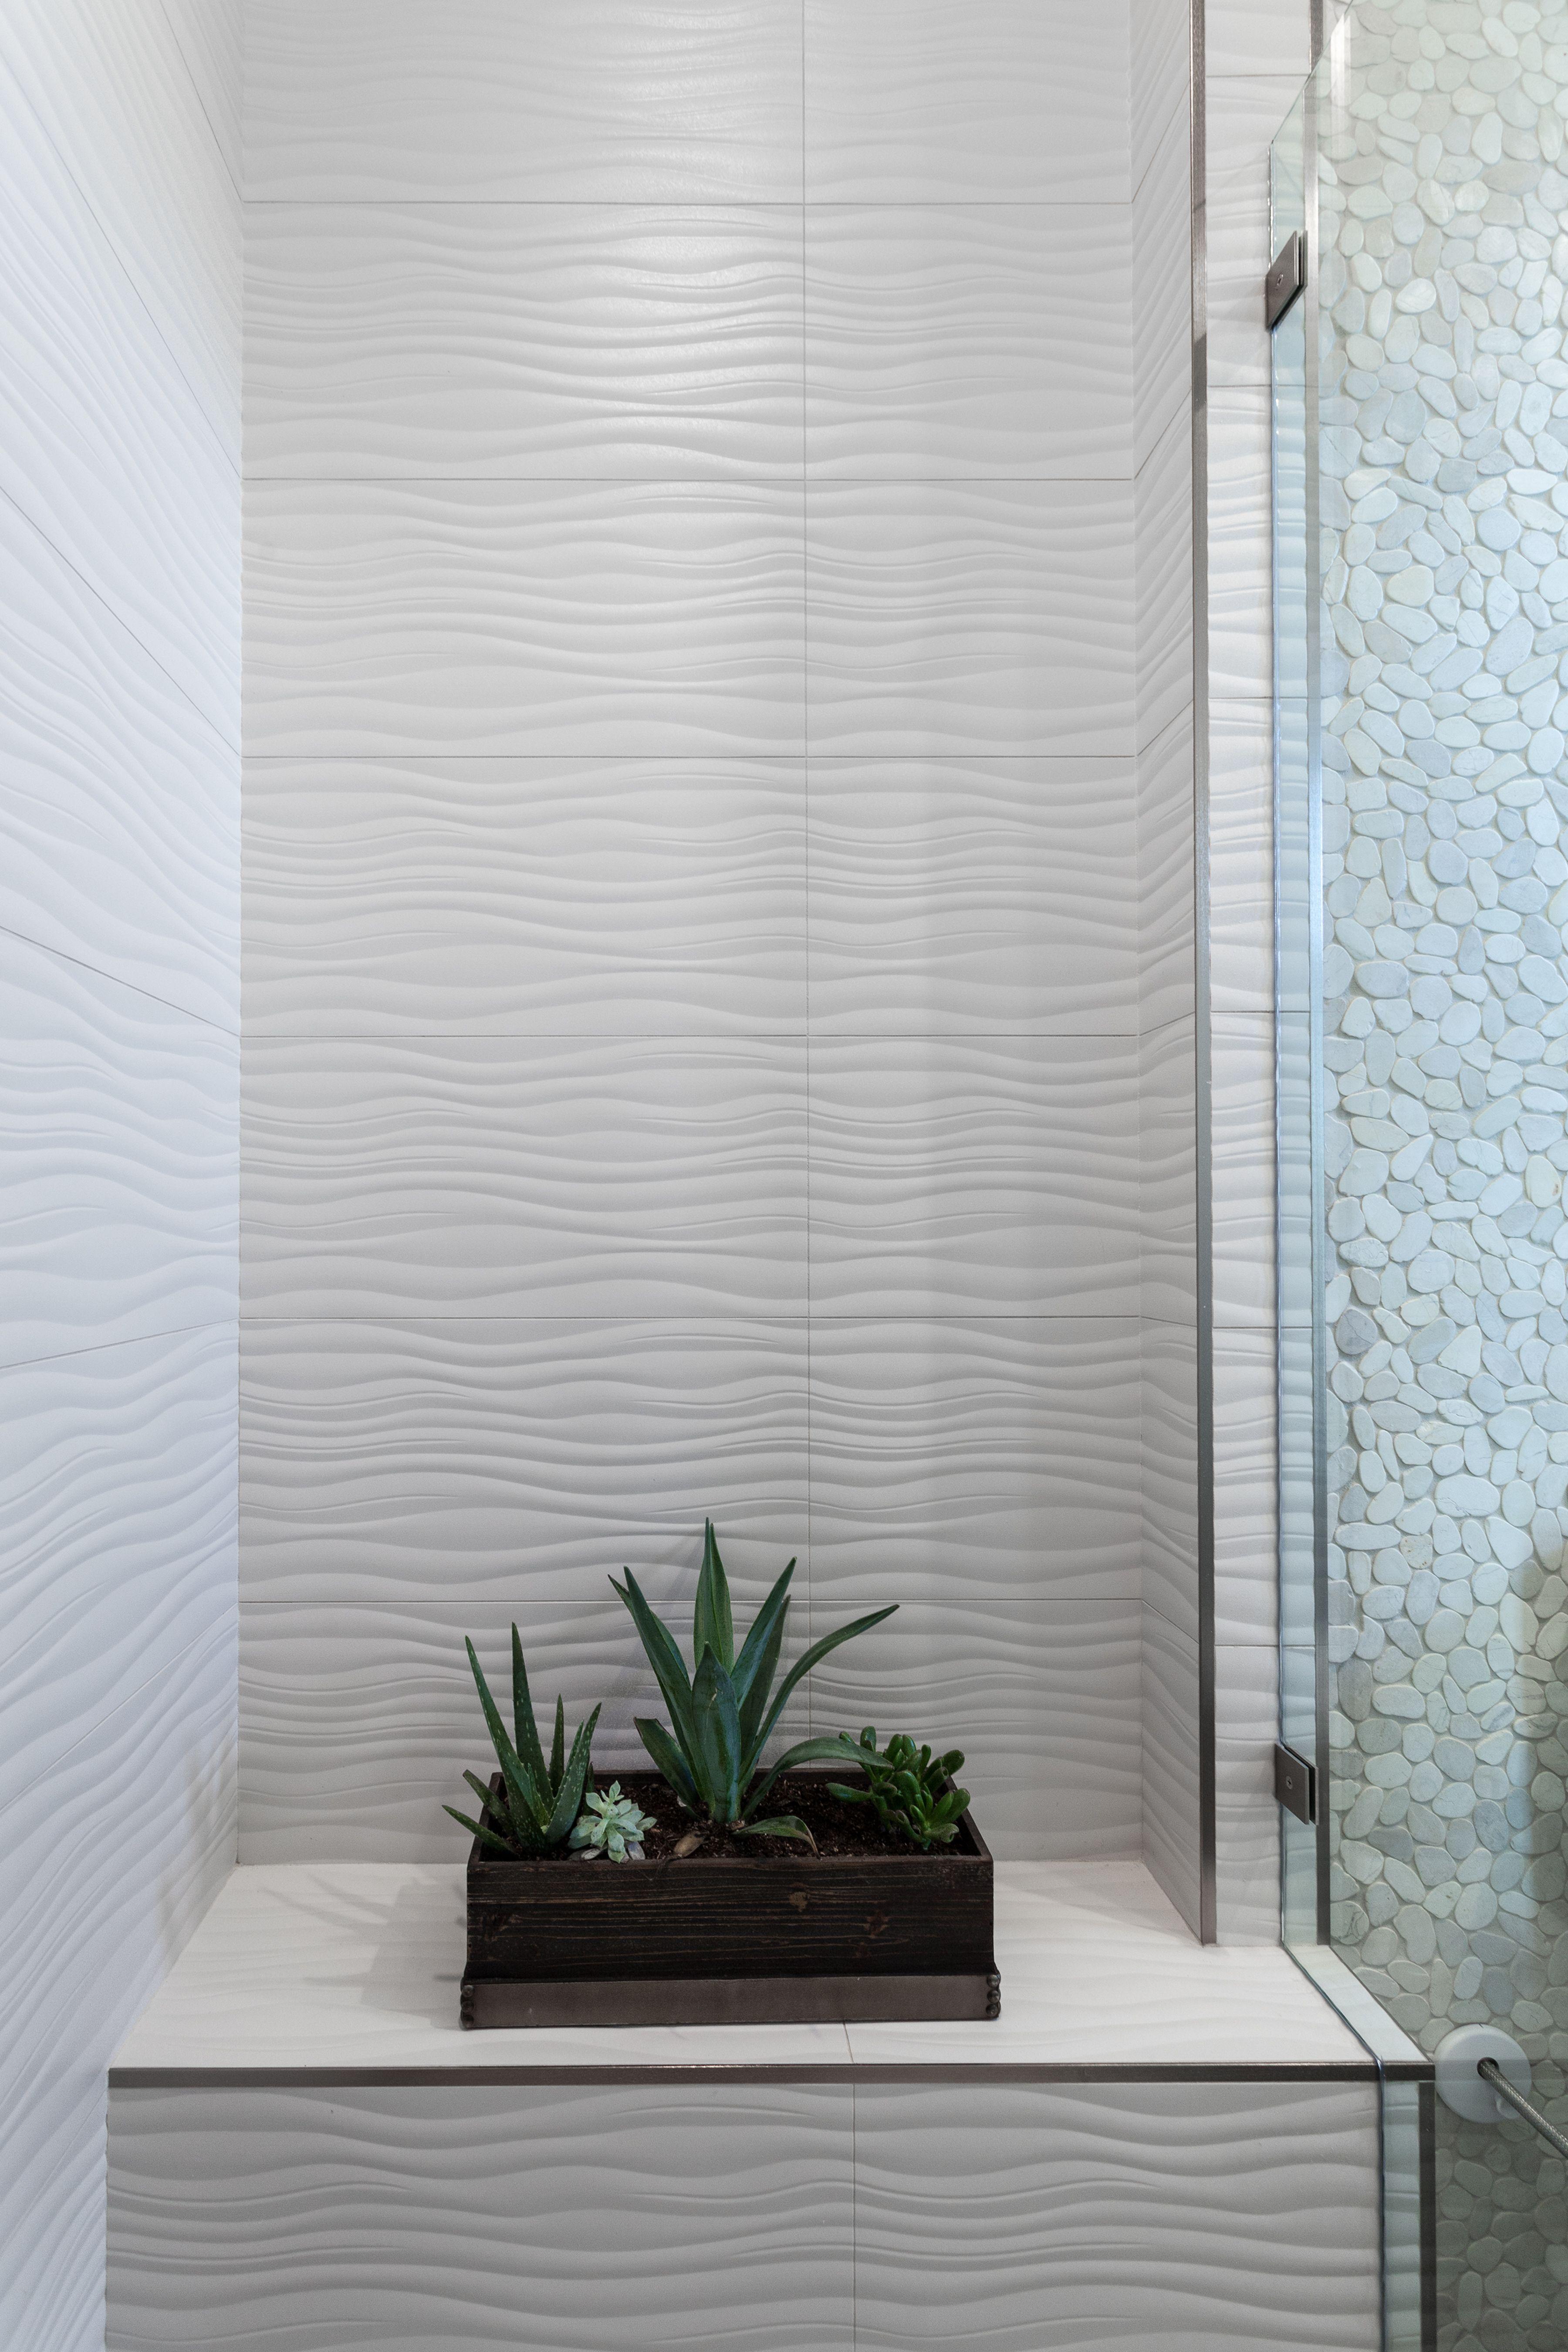 Pin by Kayla Fuller on Master bath   Pinterest   Bathroom ...